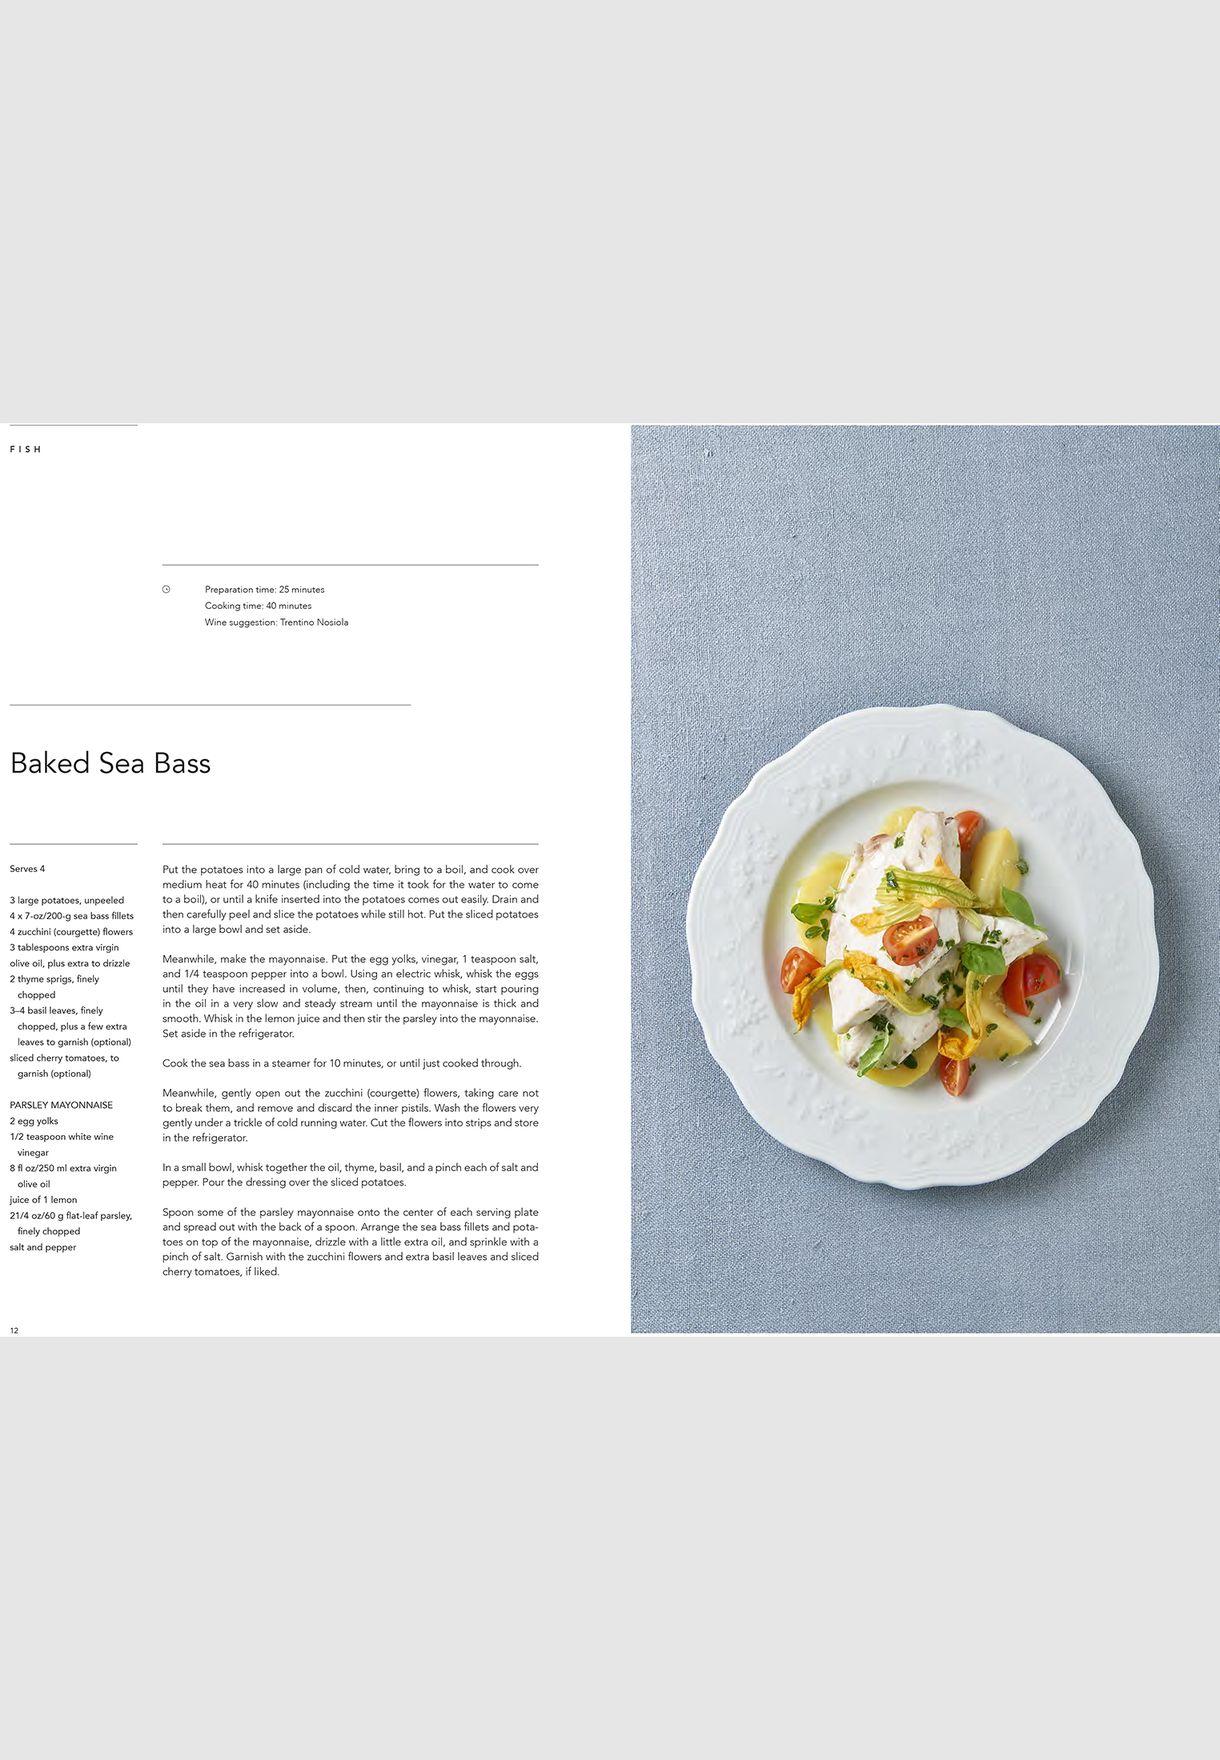 Eataly: Contemporary Italian Cooking